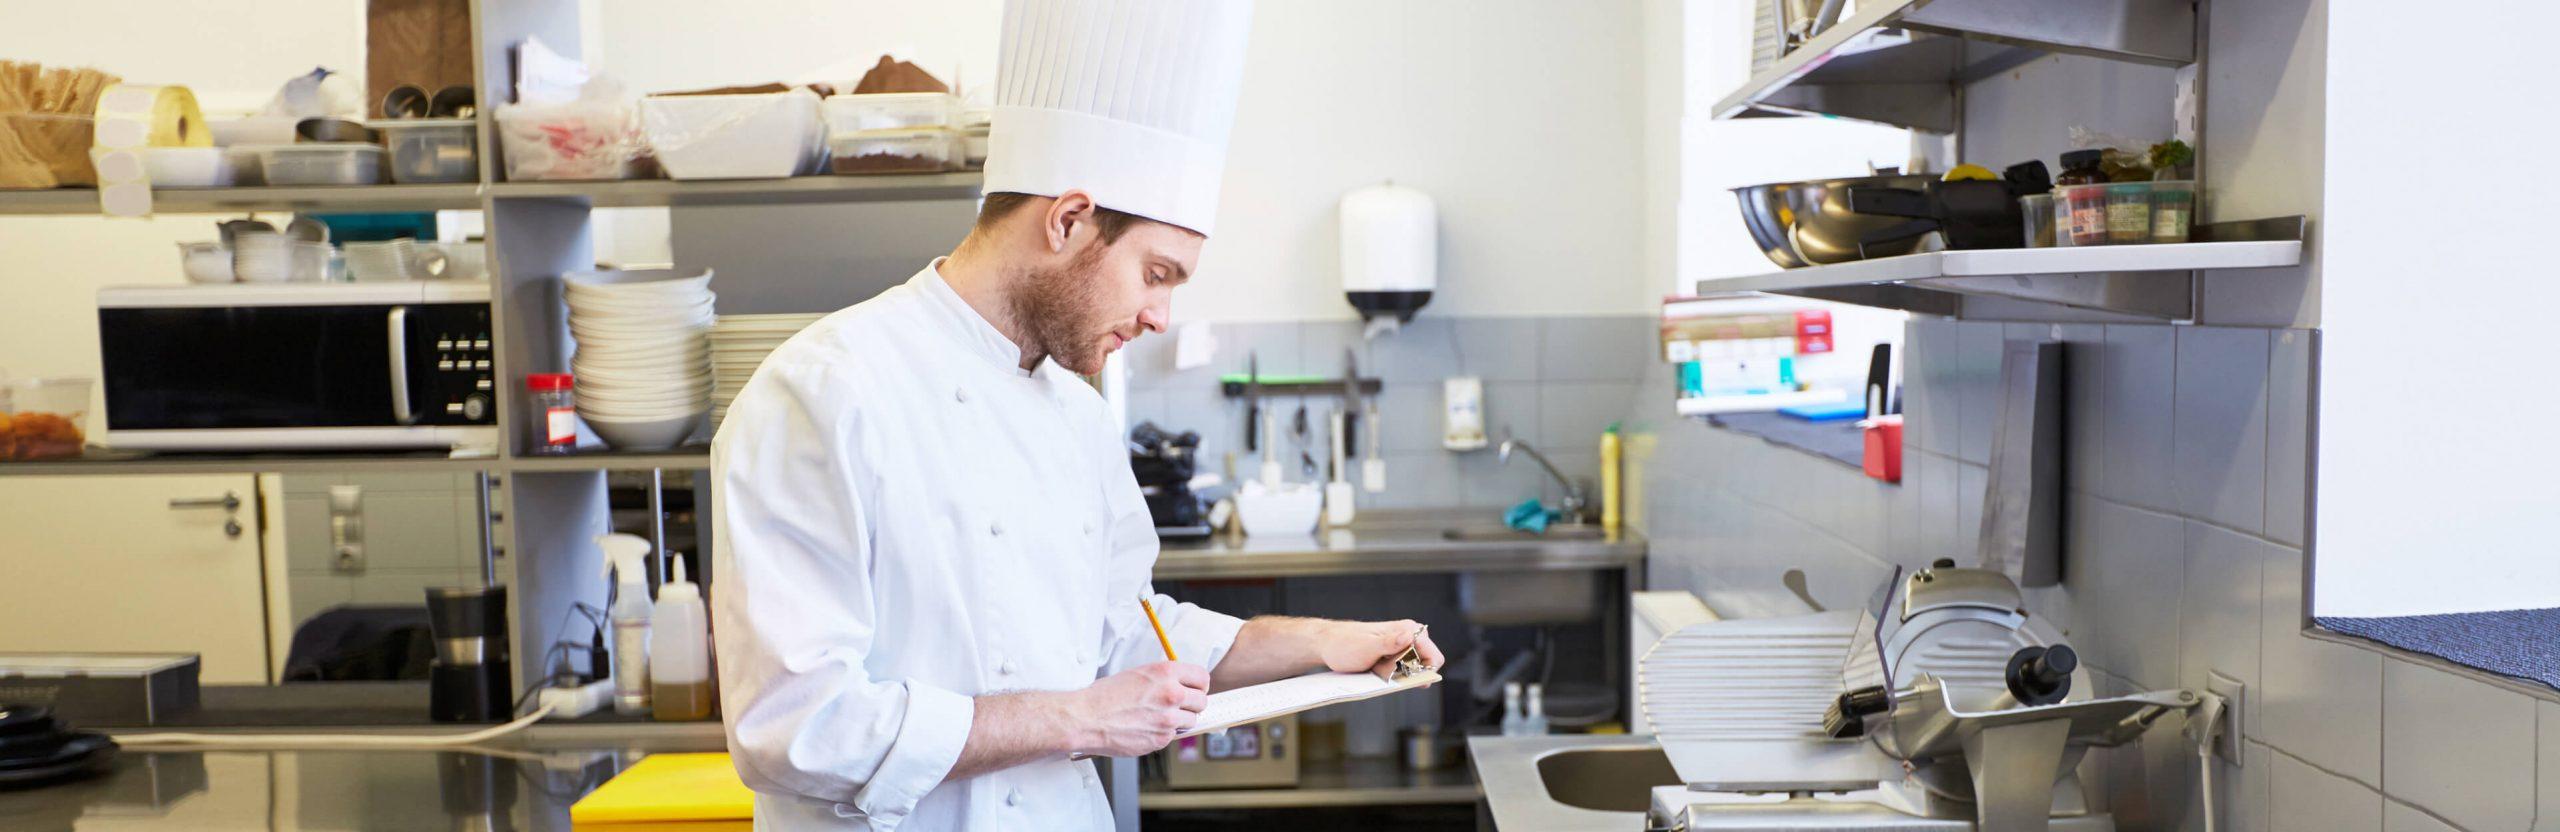 Restaurant Inventory Management System